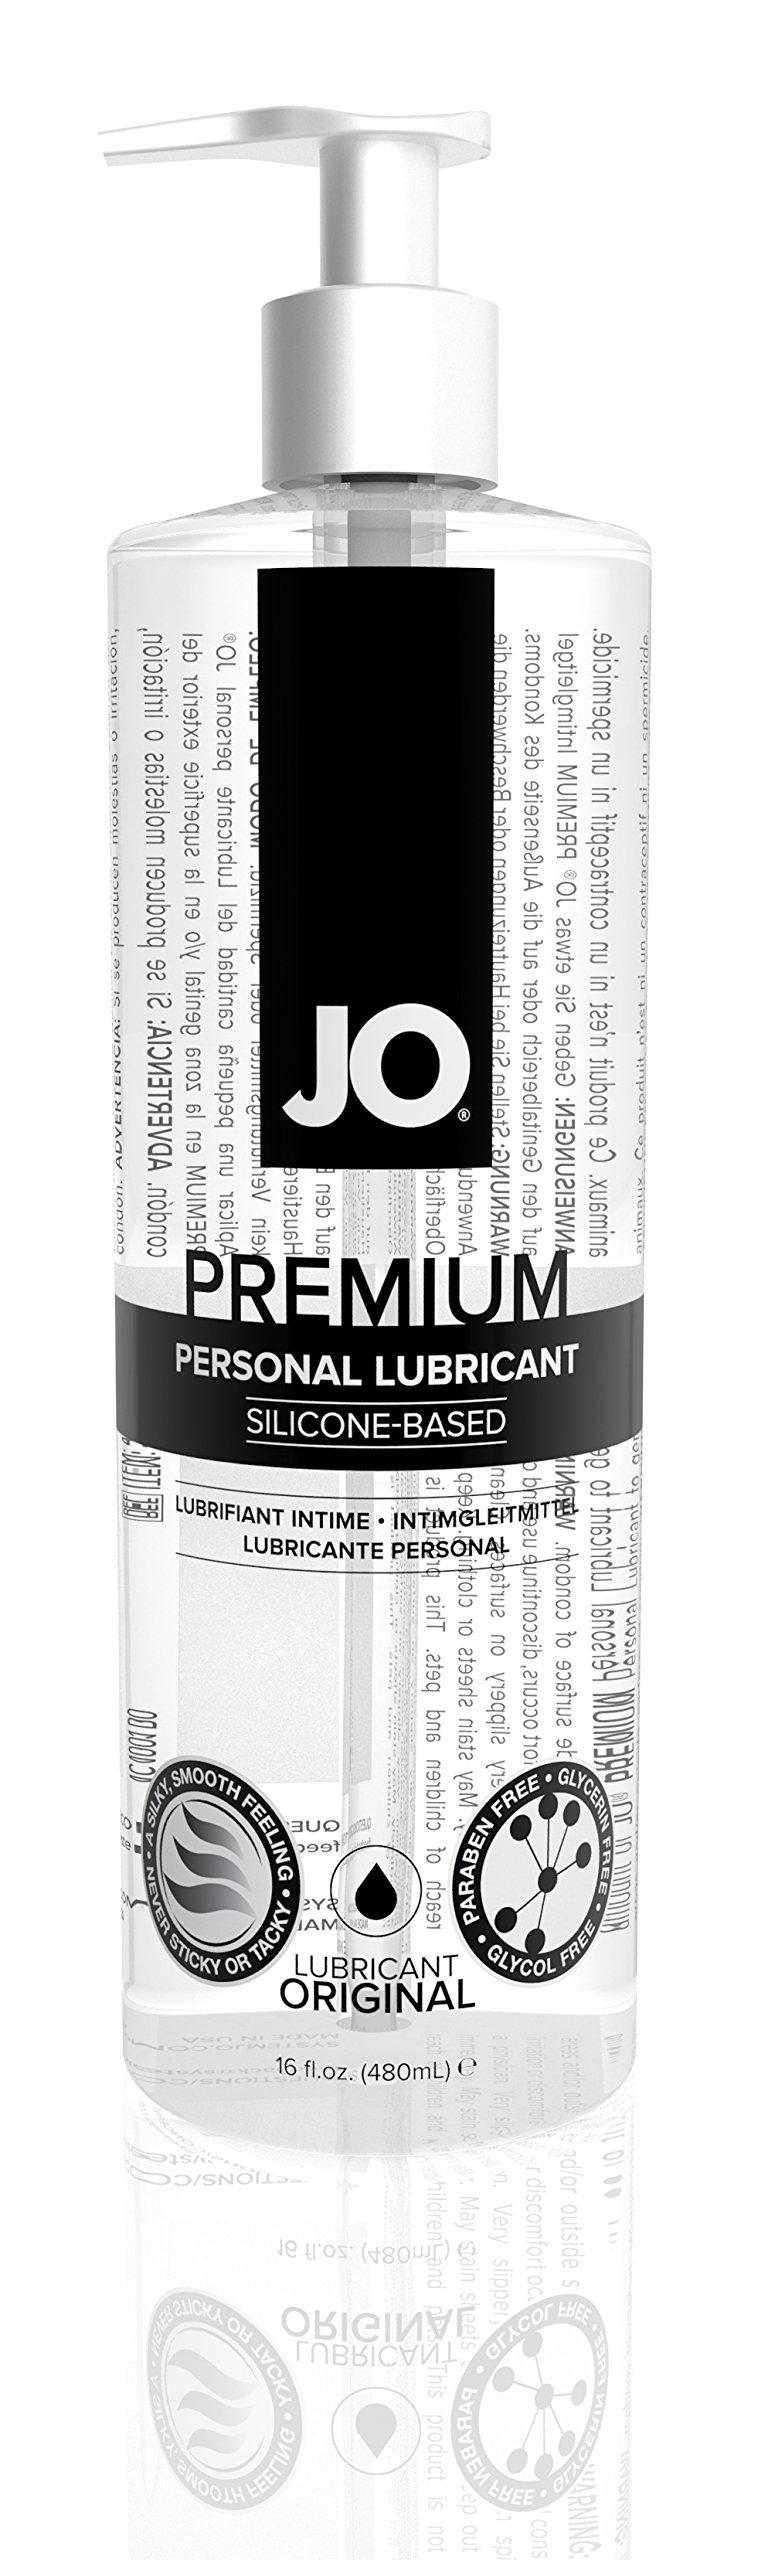 JO Premium Silicone Lubricant - Original (16 oz) by System Jo